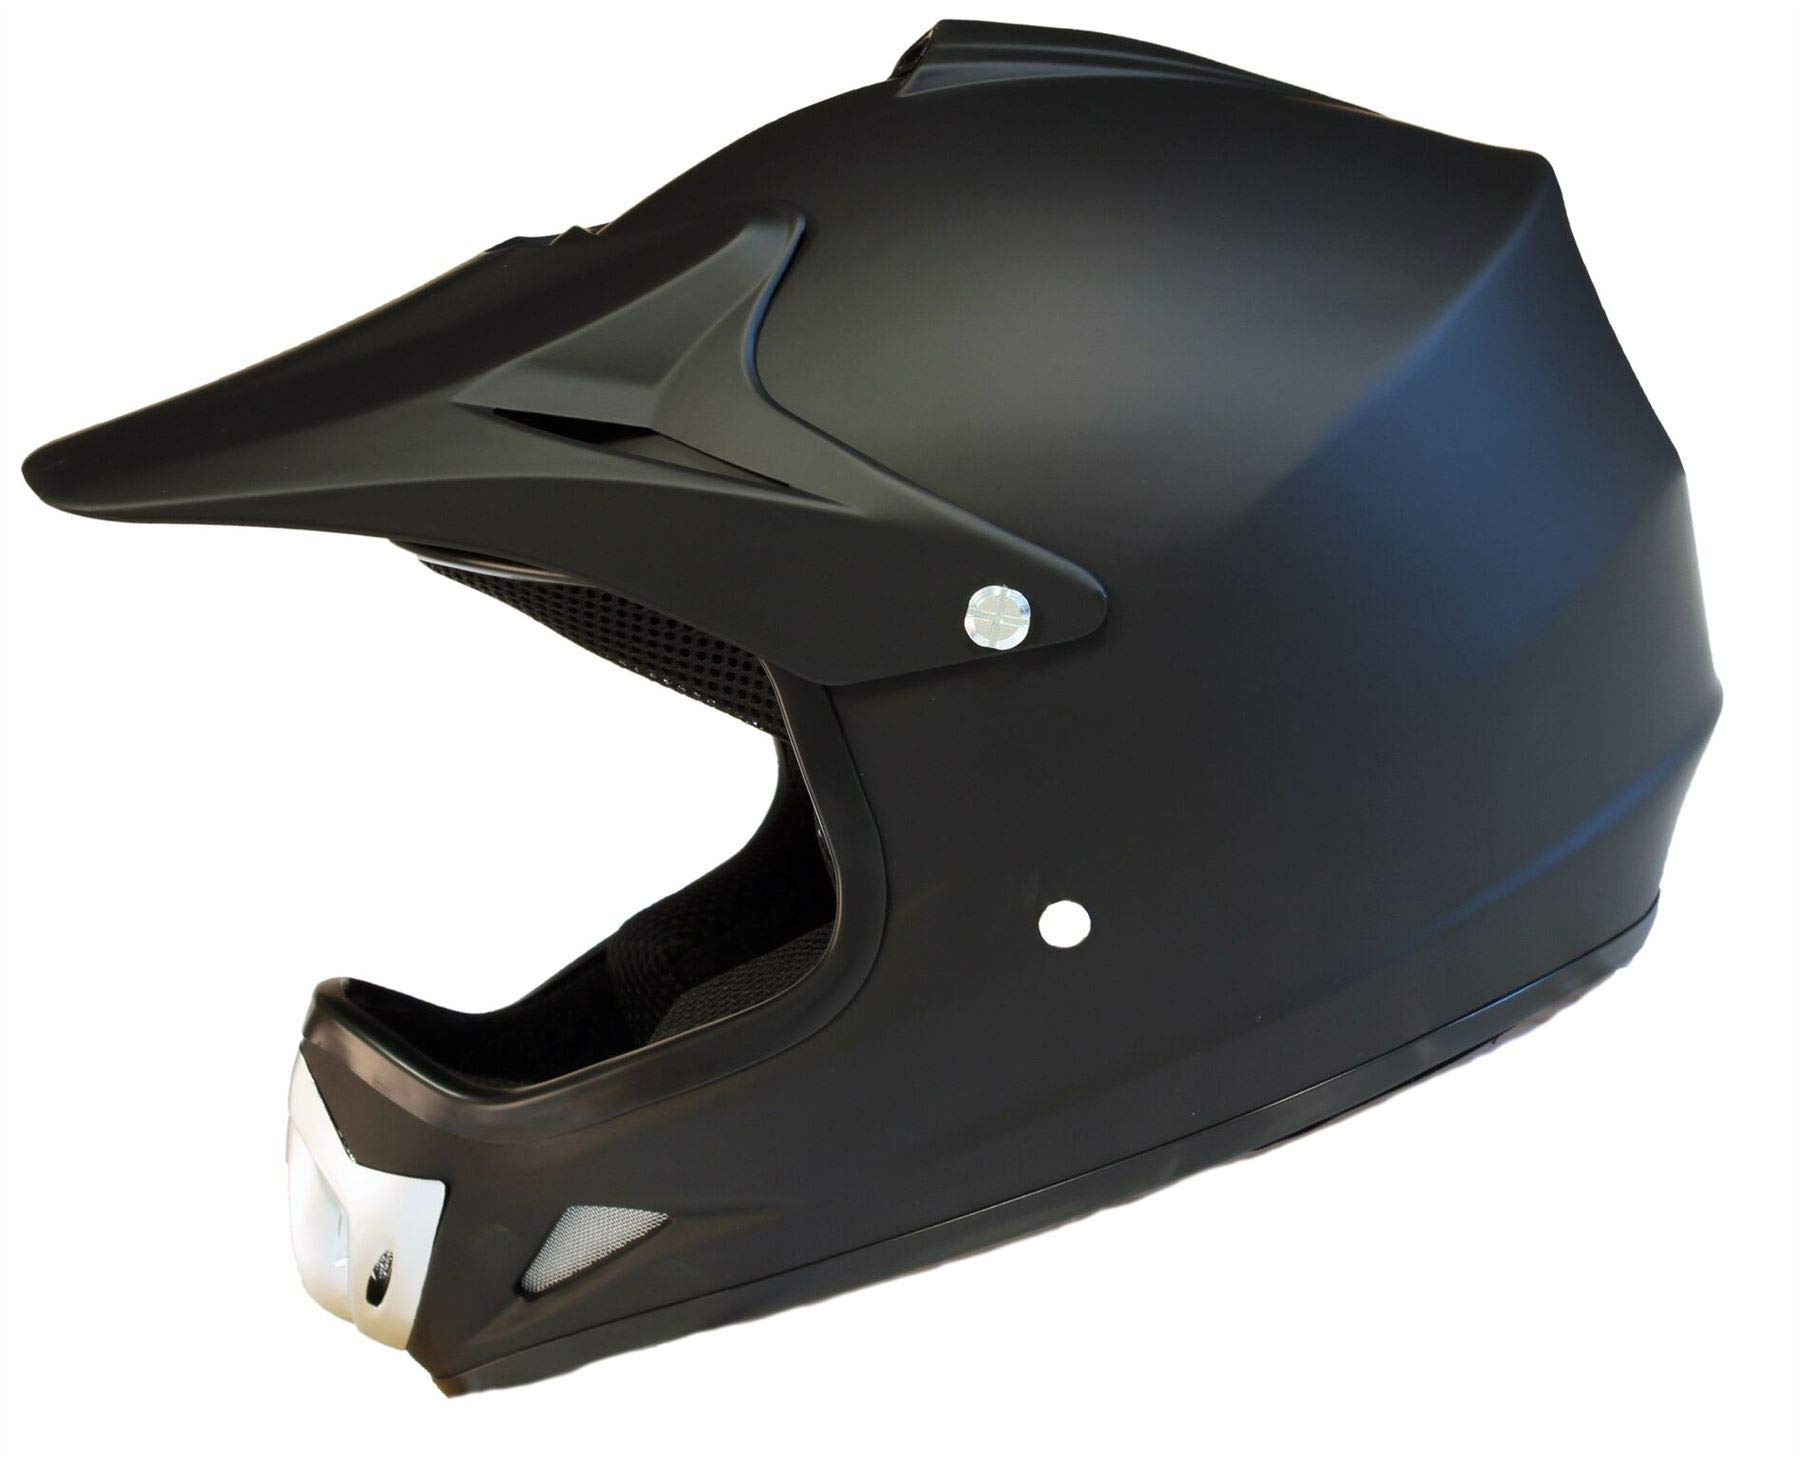 Medium Qtech Childrens KIDS MOTOCROSS MX Style Helmet BMX Quad Bike Quasar Matt Black